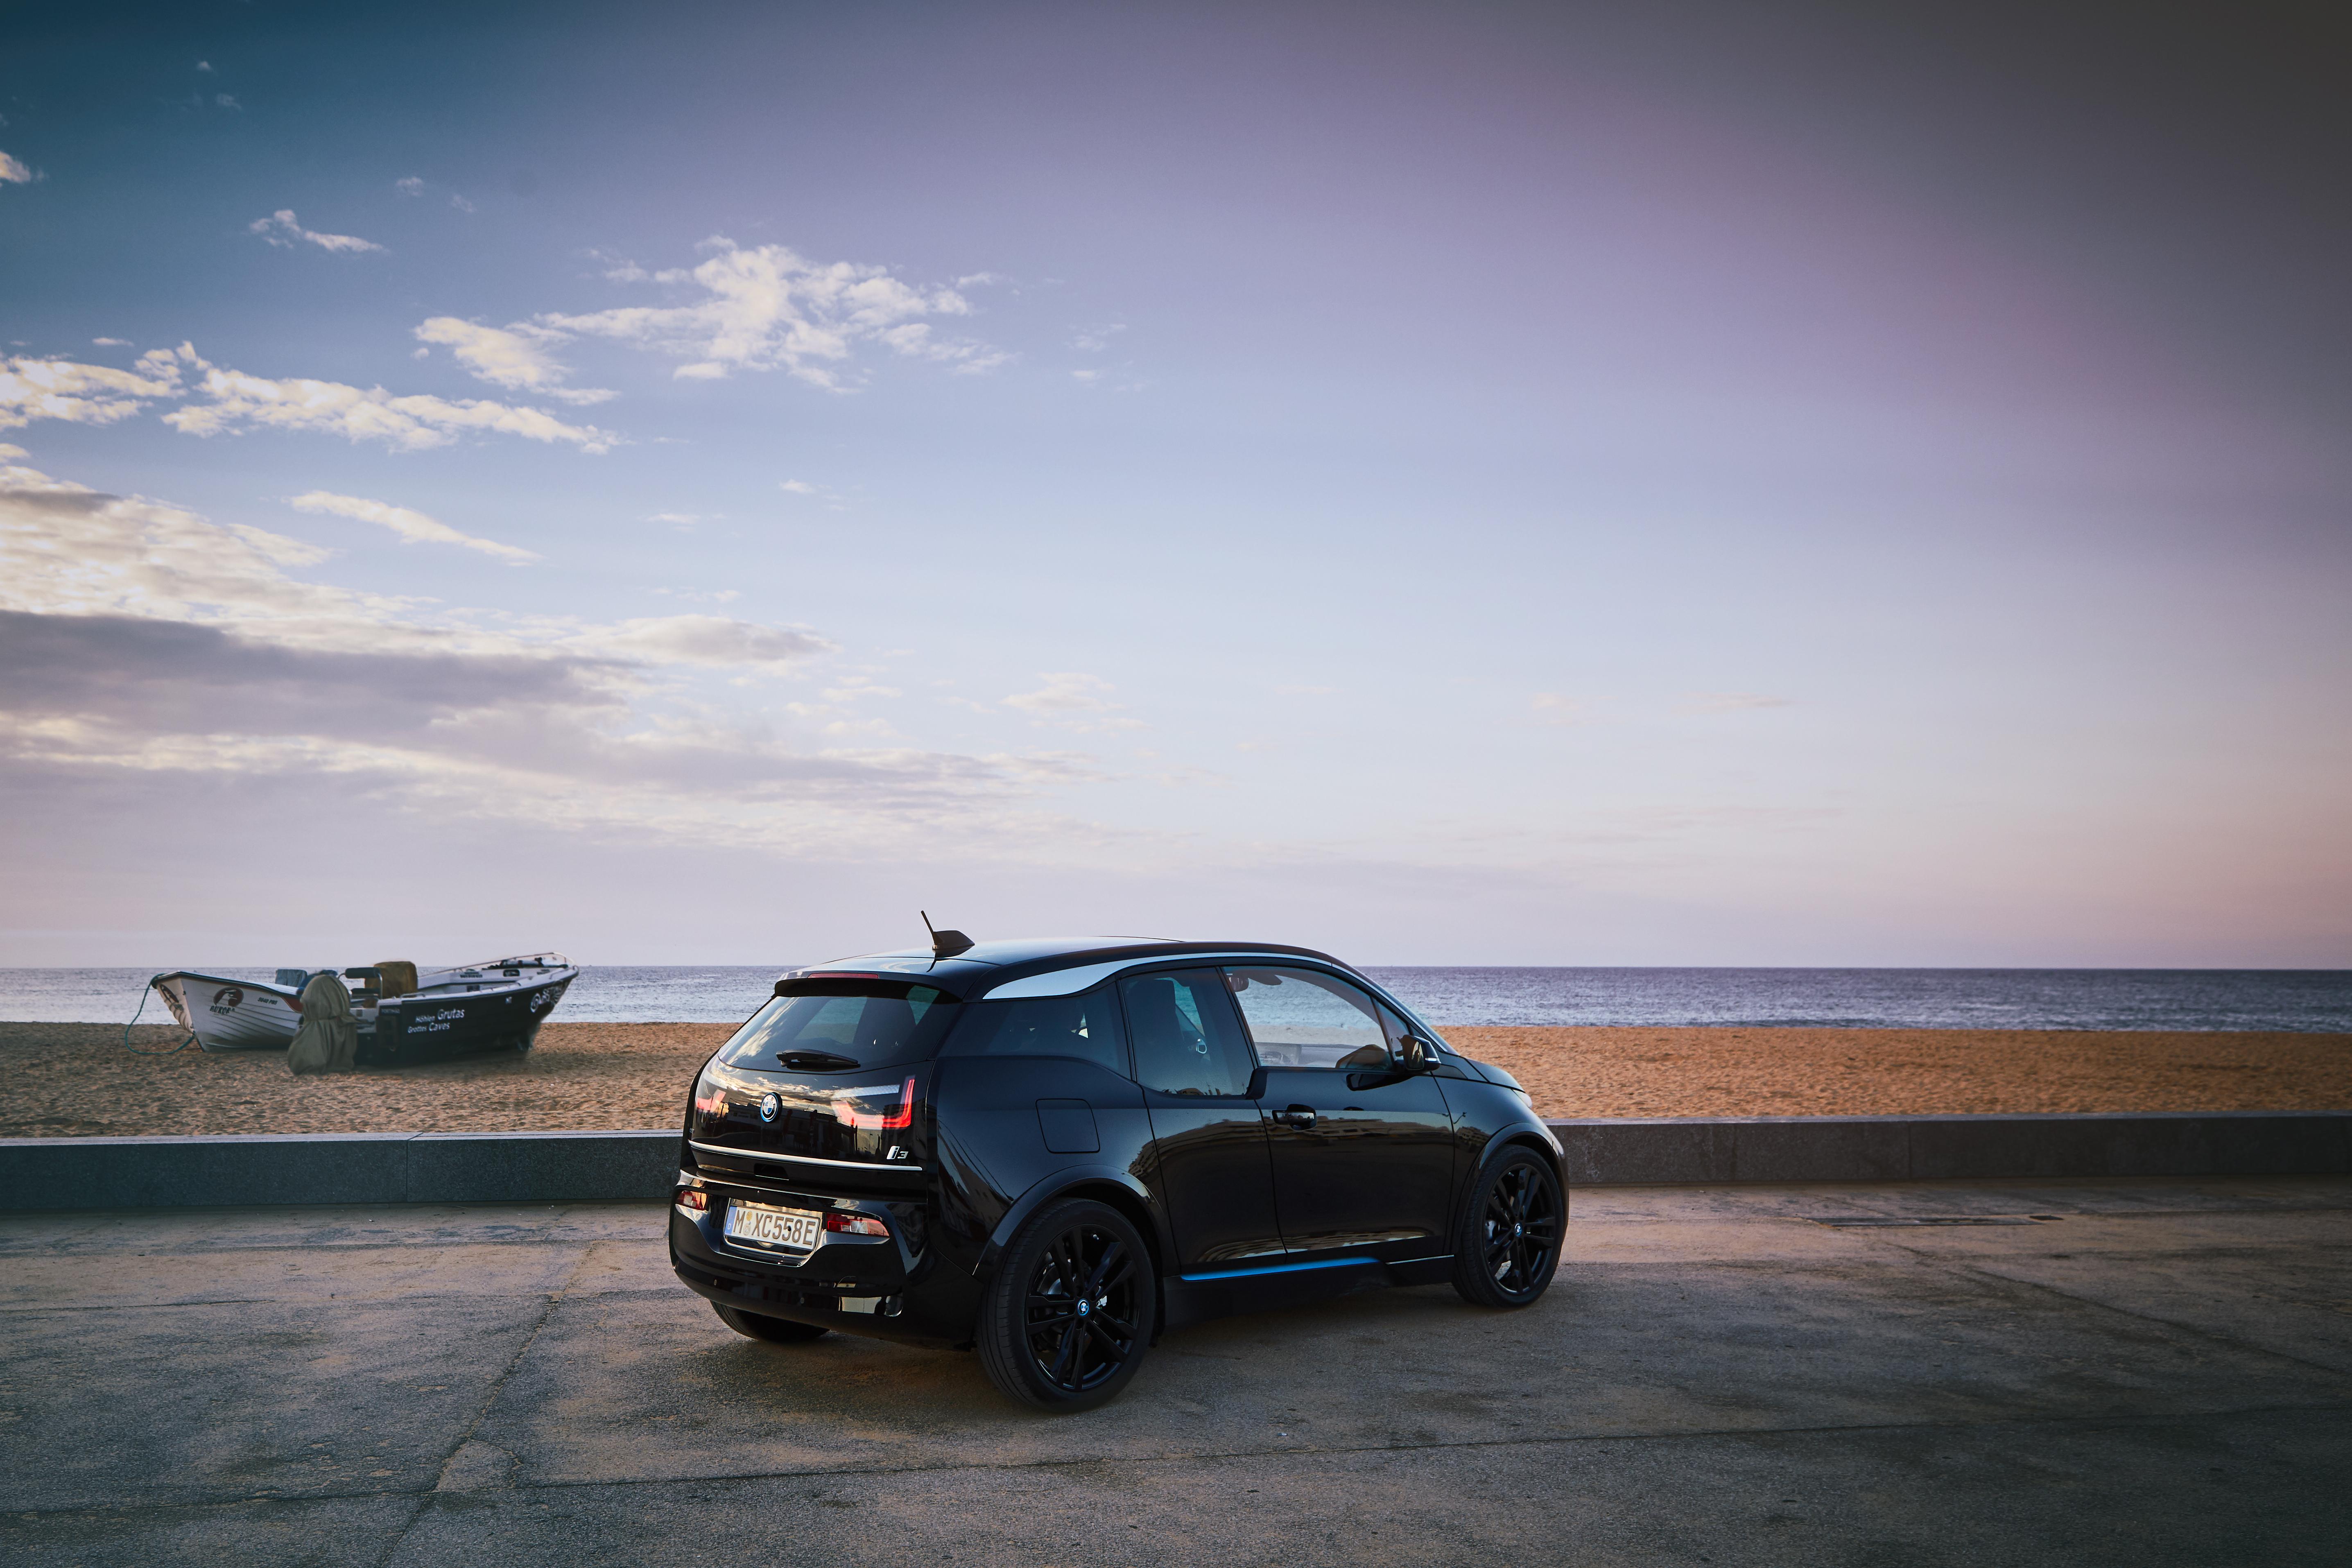 Vanzarile si cota de piata ale BMW Group au continuat sa creasca in mai